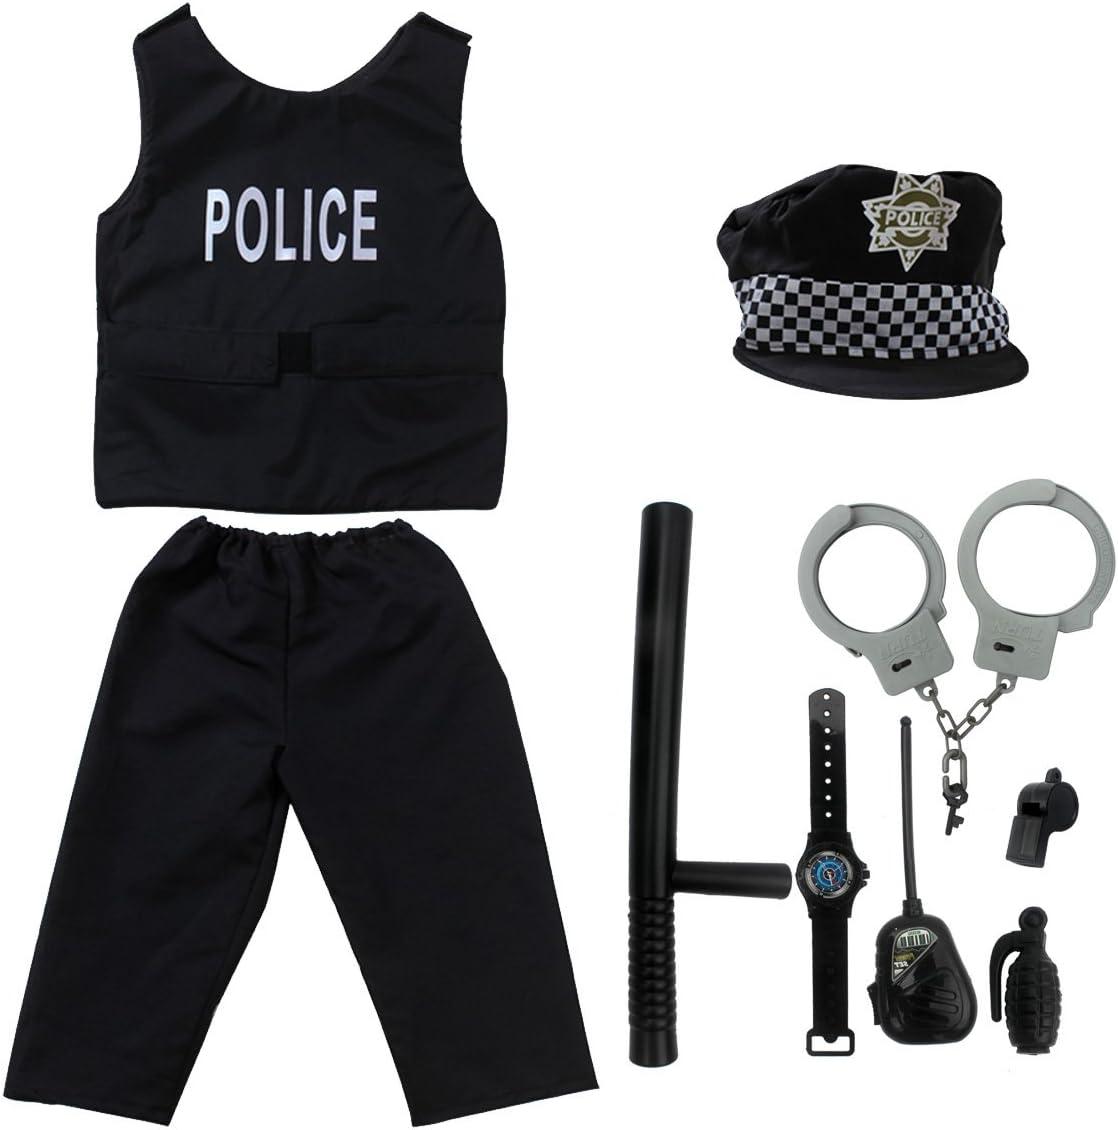 YiZYiF Mens 5PCS Police Officier Costume Outfit Brief Cuff Role Play Uniform Set